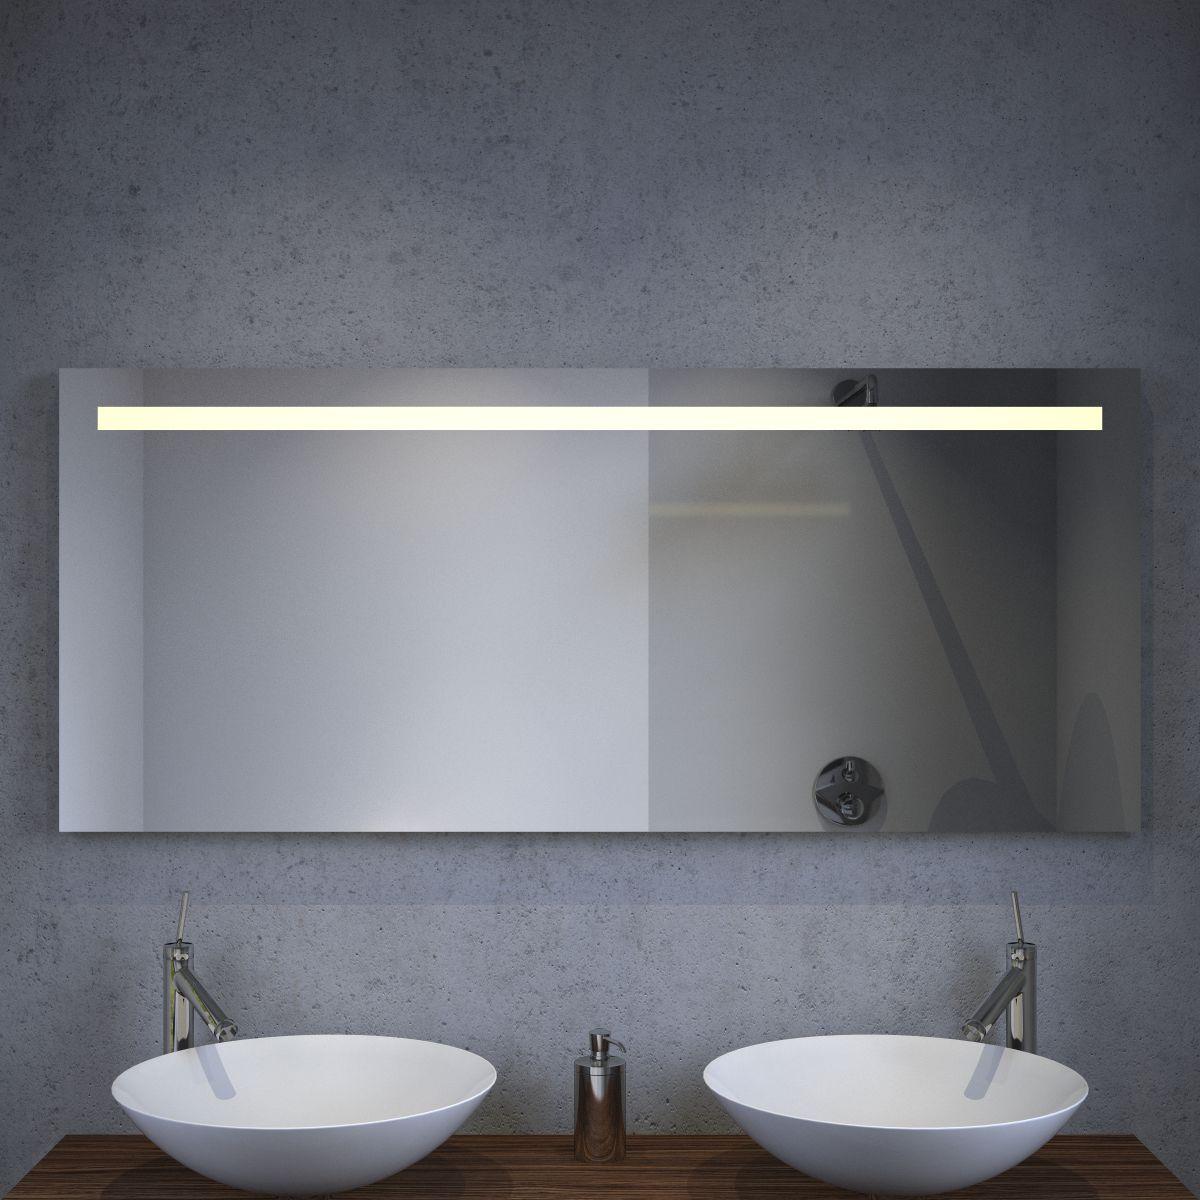 led badkamer spiegel met stopcontact verwarming en sensordimmer 140x60 cm designspiegels. Black Bedroom Furniture Sets. Home Design Ideas